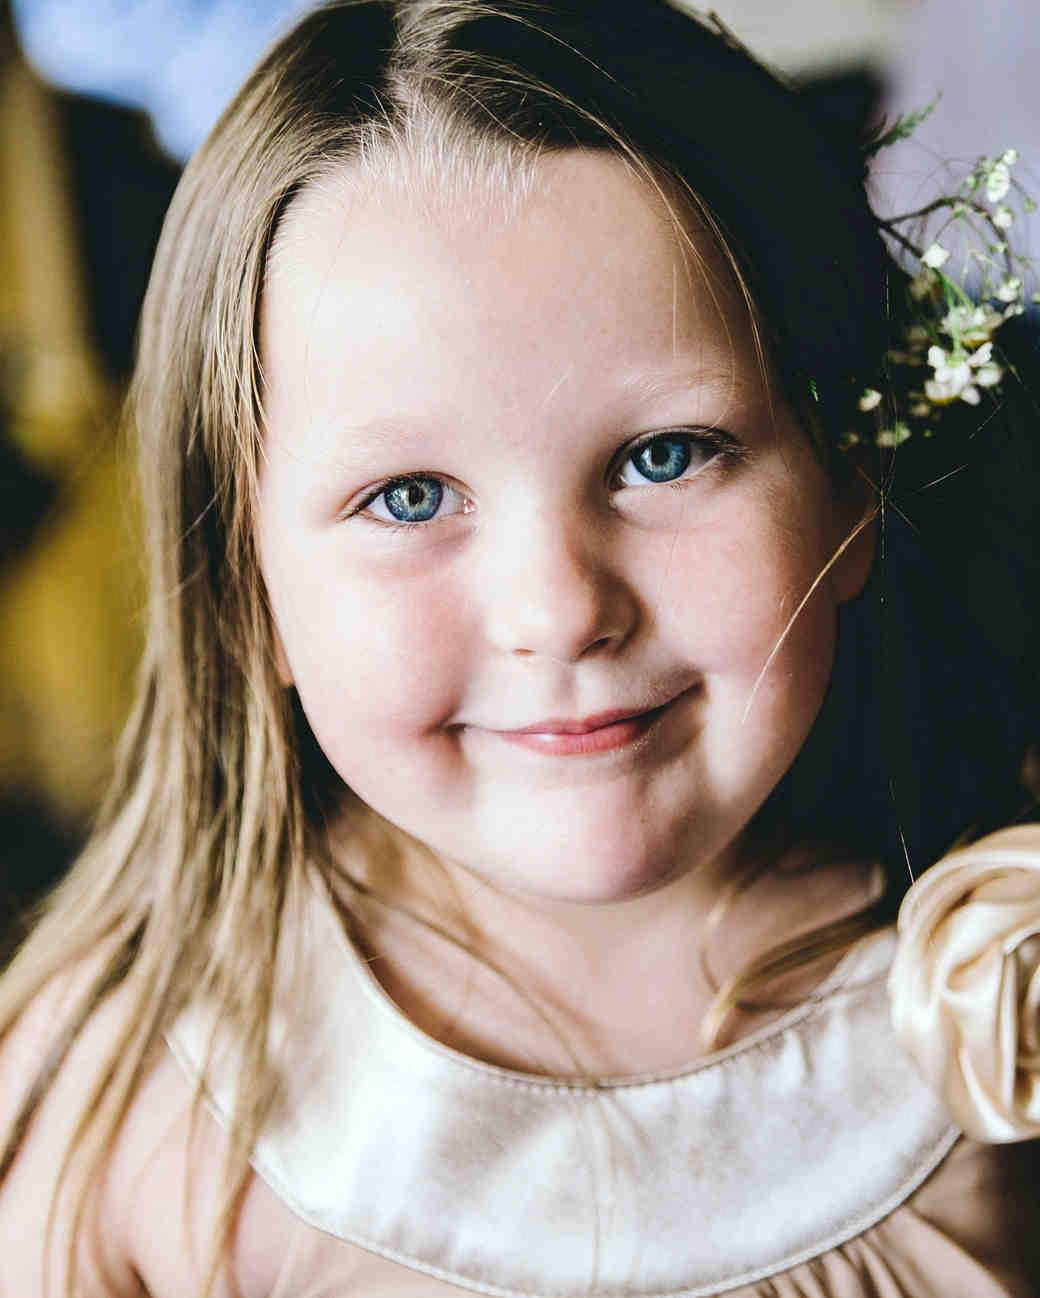 sadie-brandon-wedding-flowergirl-97-ss112173-0915.jpg